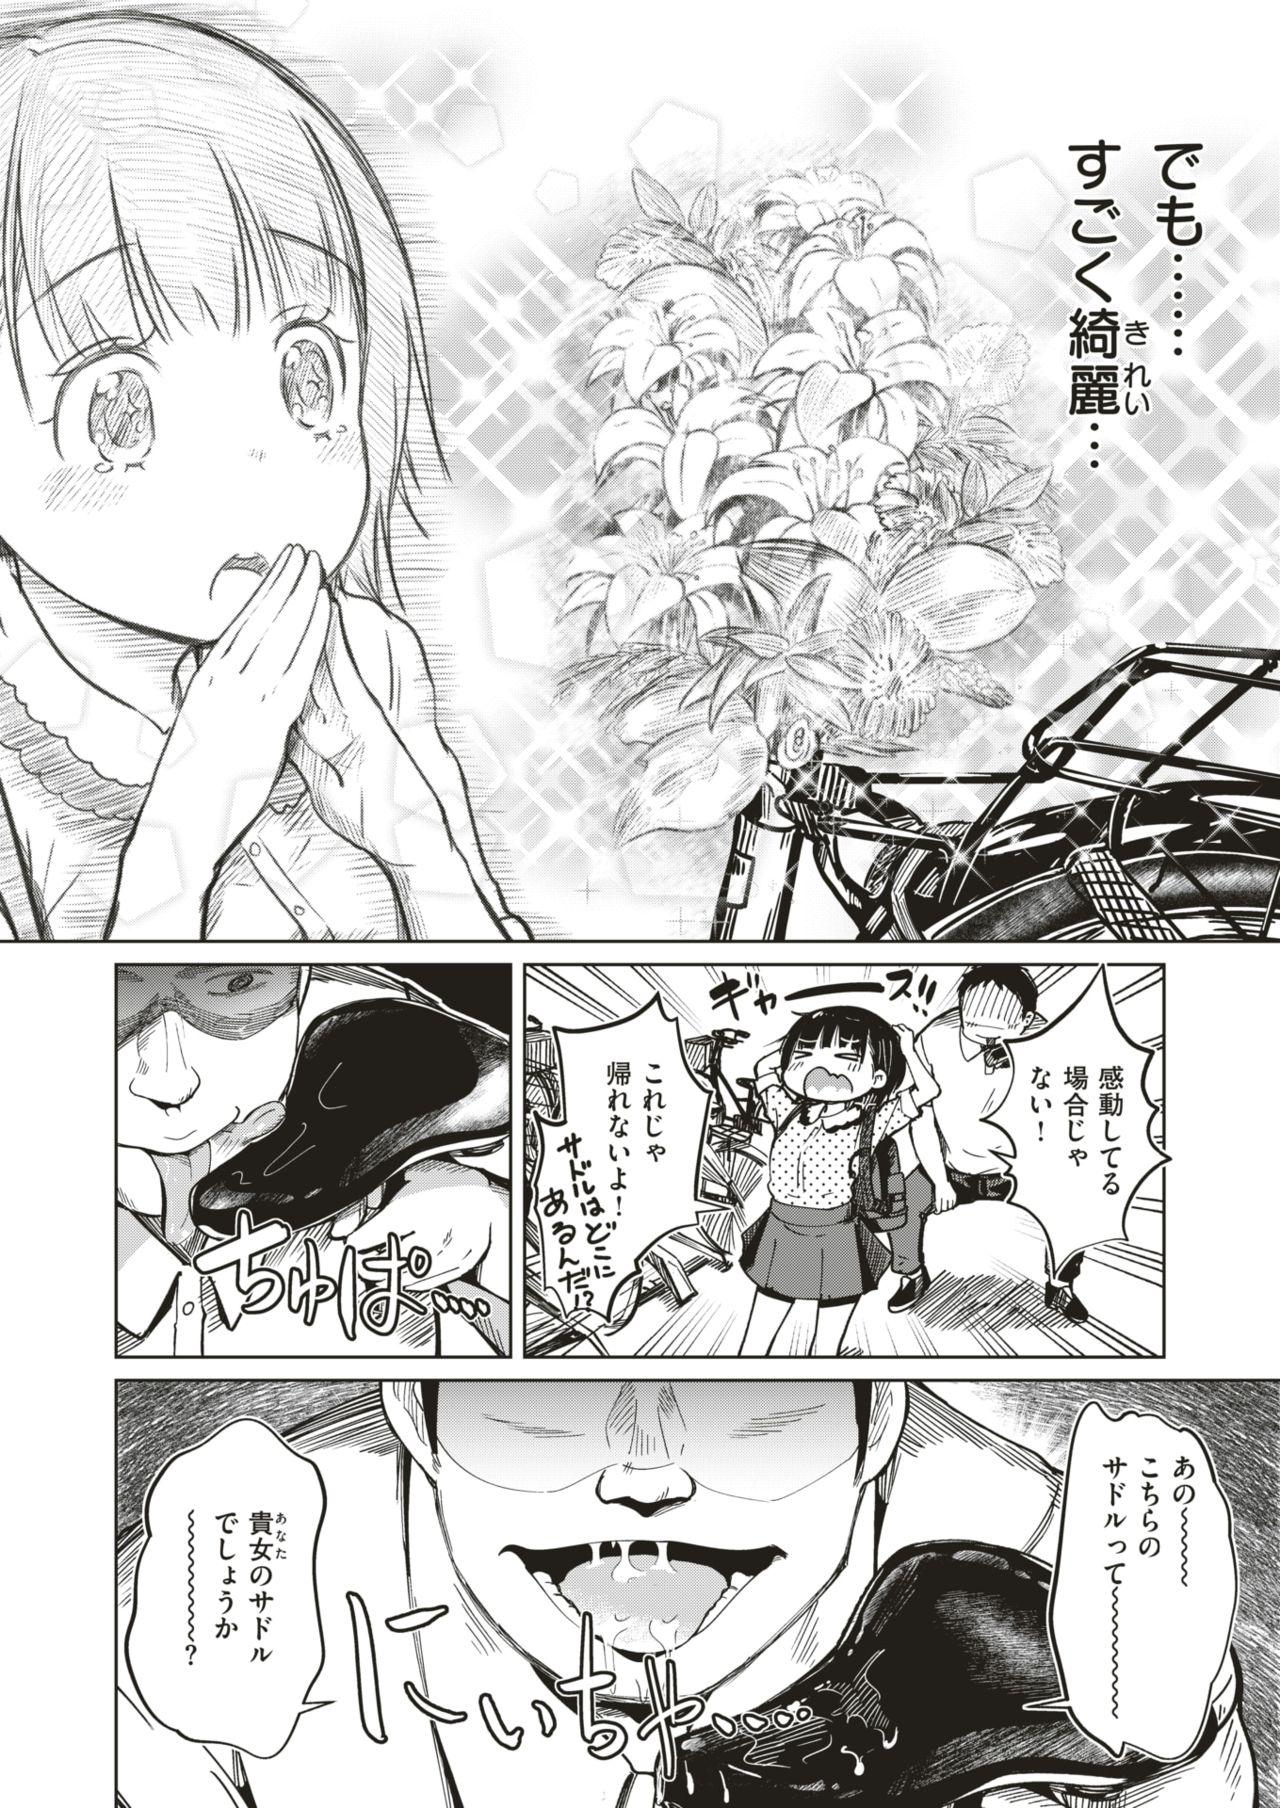 COMIC HAPPINING Vol. 4 104